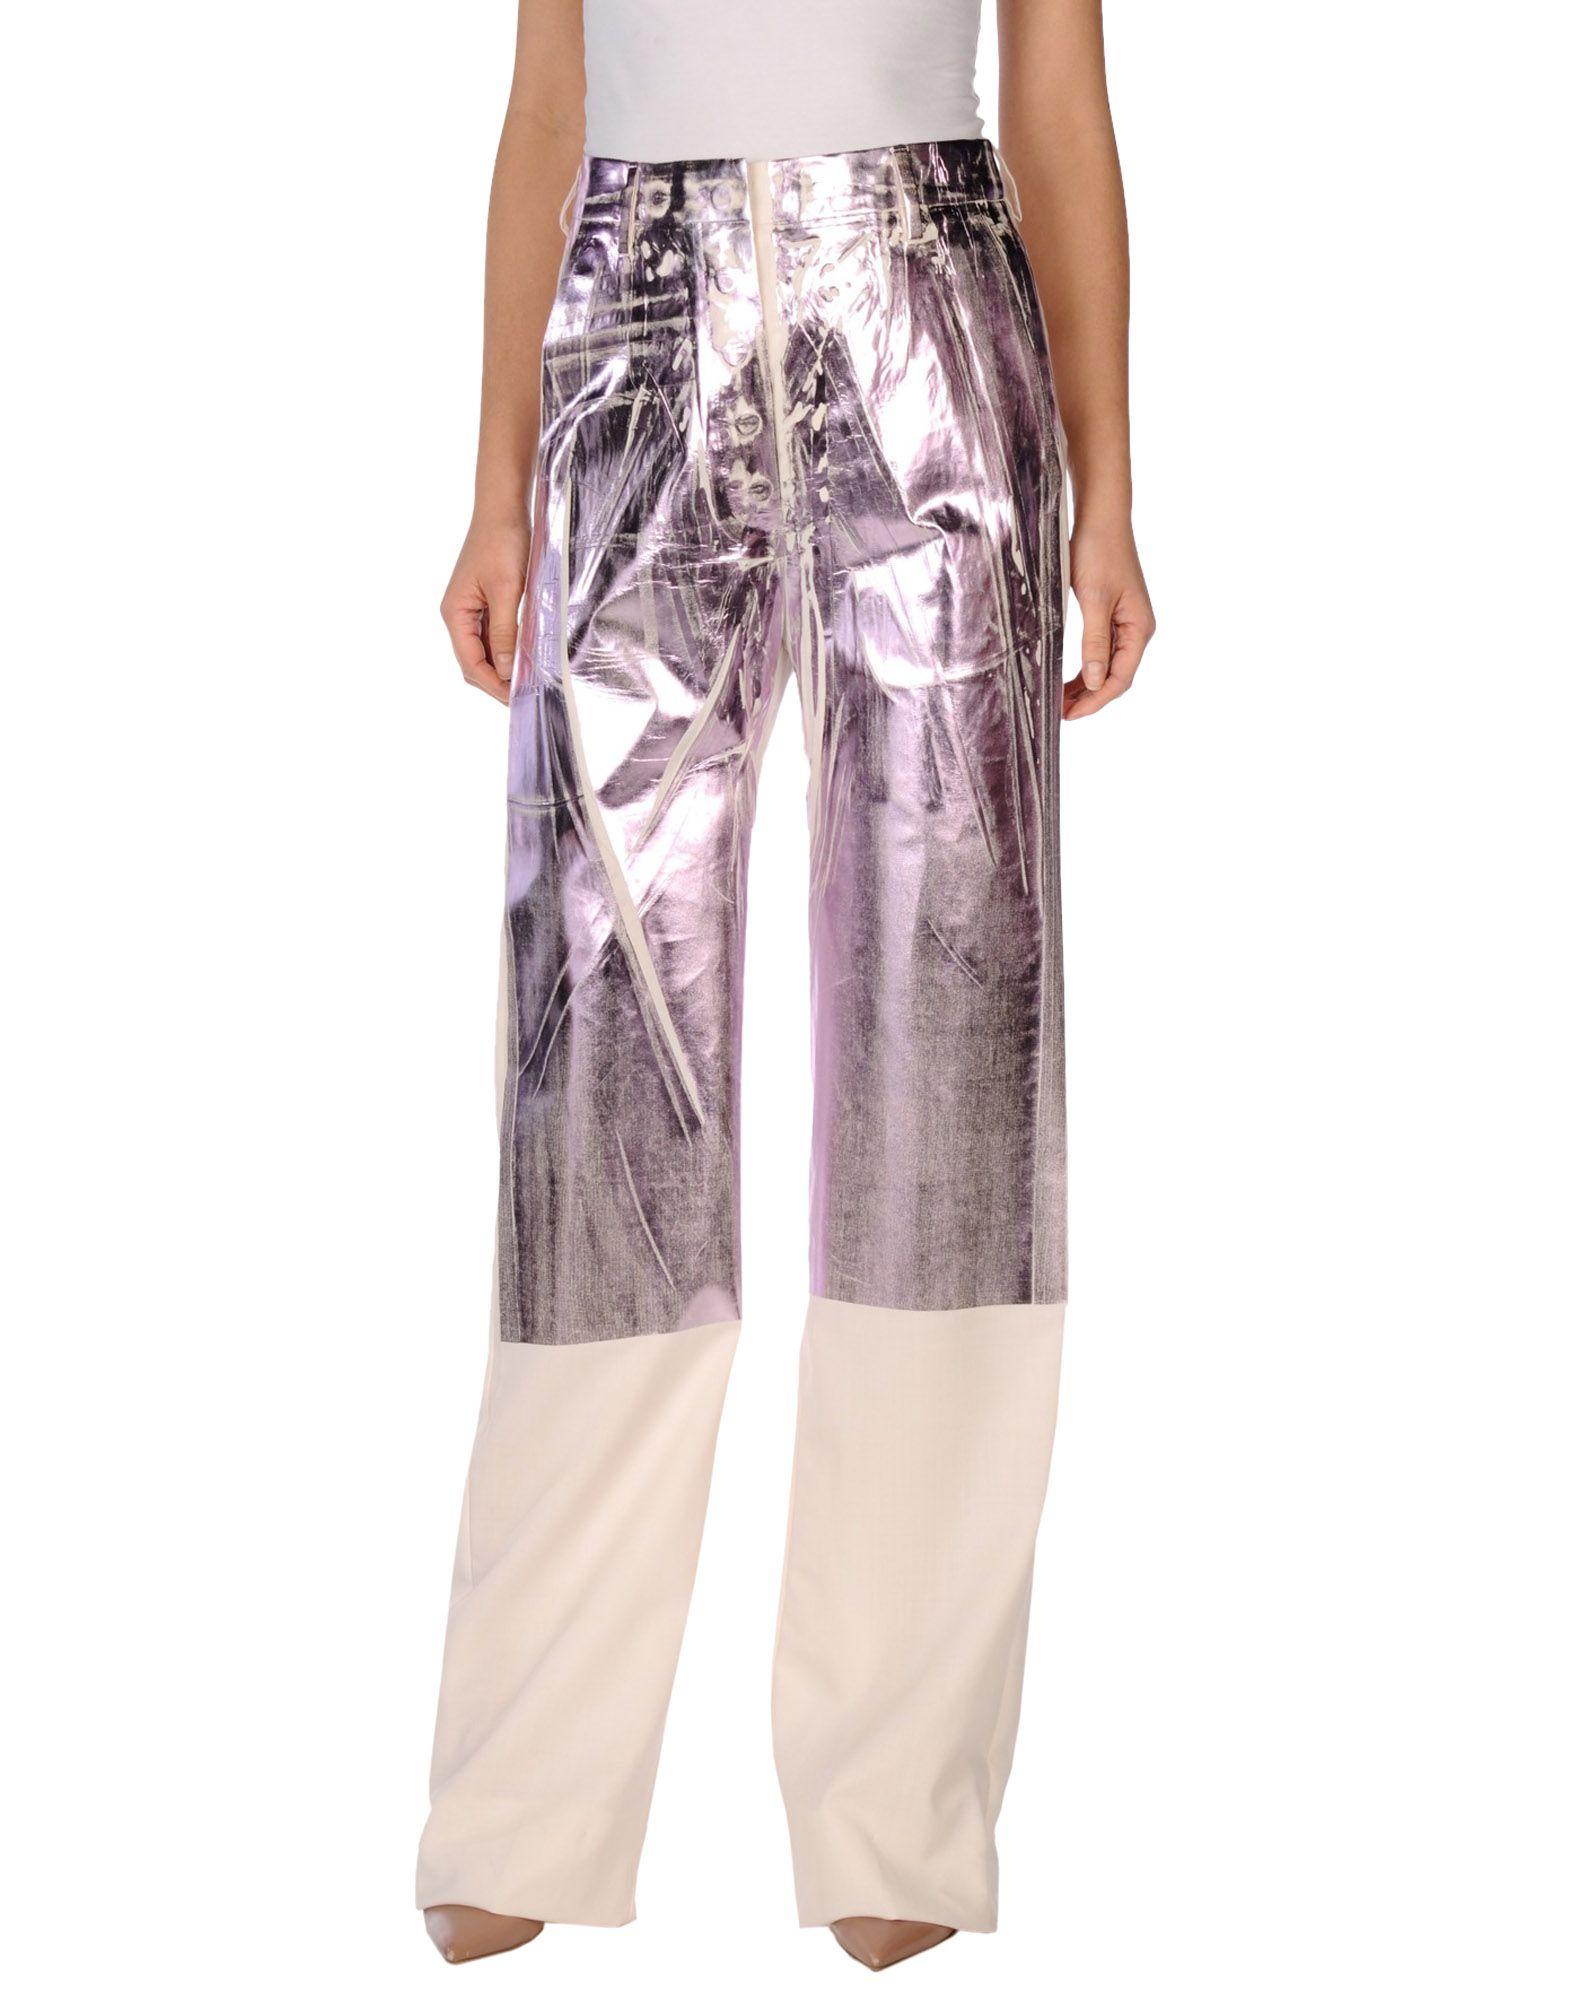 41a88fcea9bd Buy mm6 maison margiela clothing for women - Best women s mm6 maison  margiela clothing shop - Cools.com